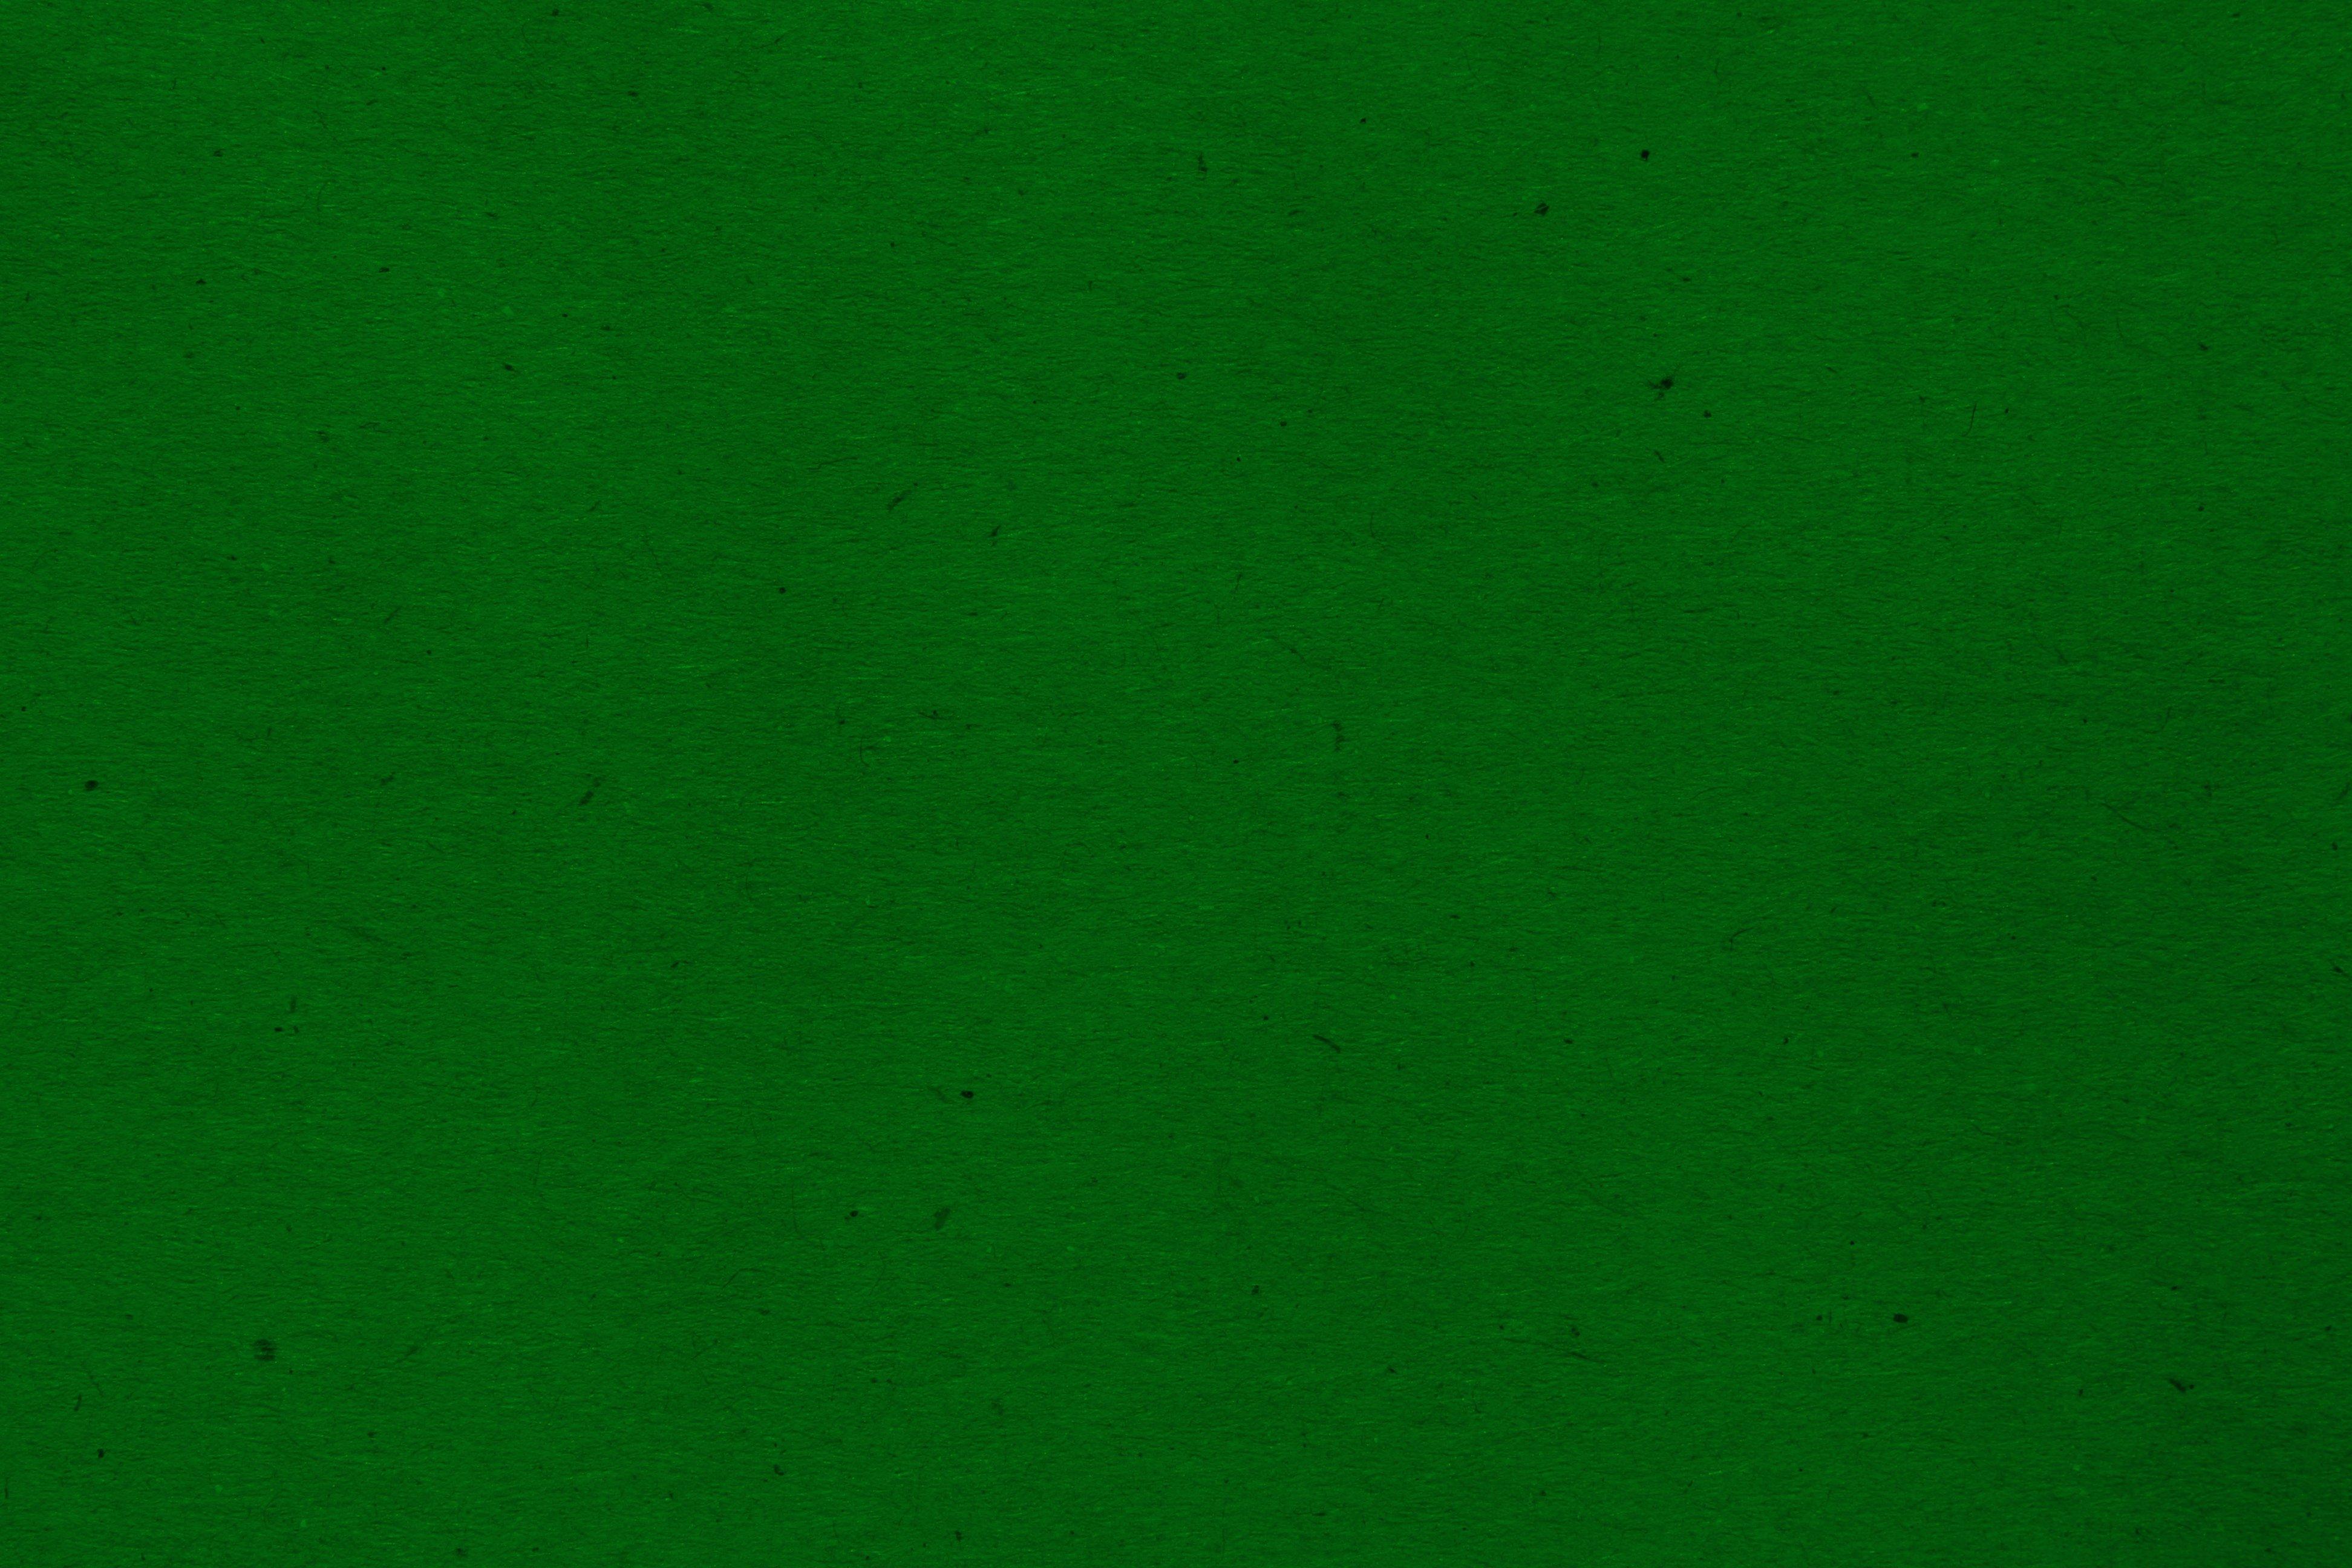 Dark Green Wallpaper Hd: Dark Green Background Wallpaper